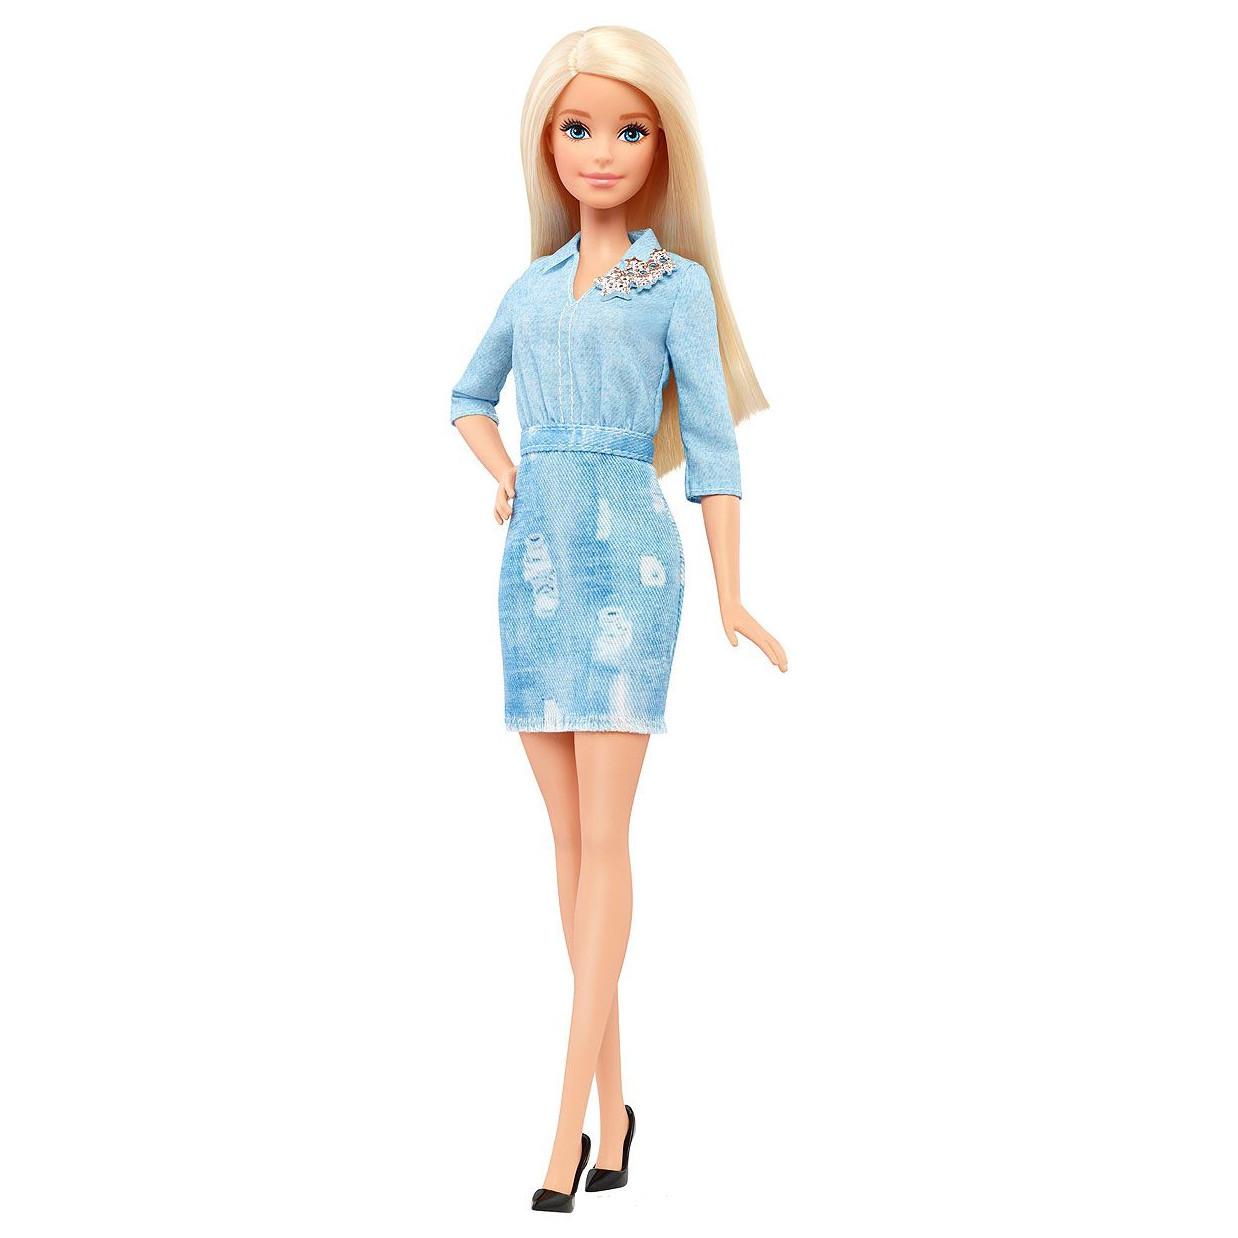 Кукла Барби модница в джинсовом голубом платье  Barbie Fashionistas Doll 49 Double Denim Look